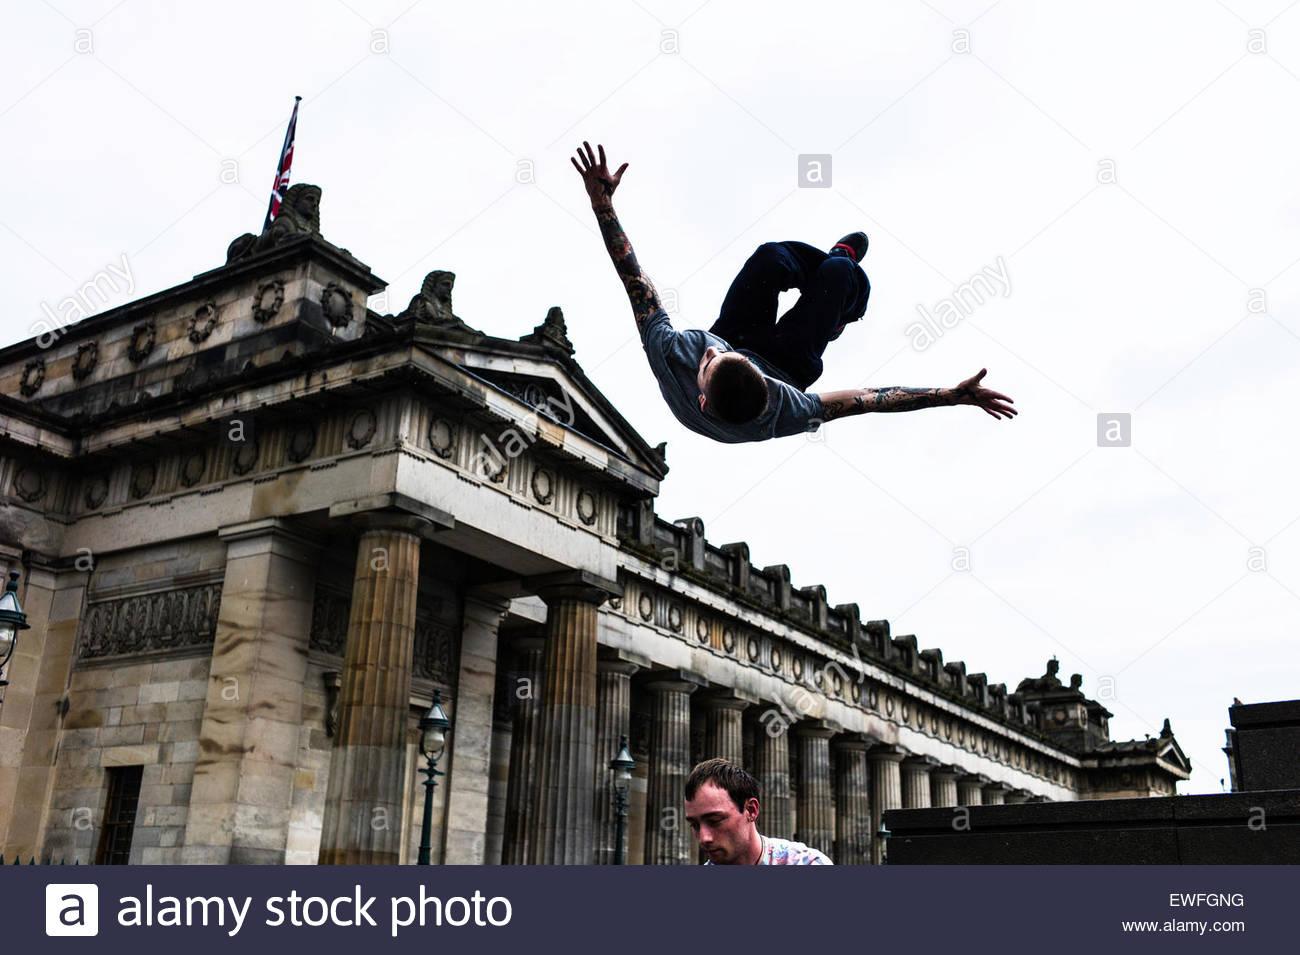 Edinburgh, Scotland, UK. 25th June 2015. Freerunners Chris Martin and Jordan Byrne performing the improvised sport - Stock Image